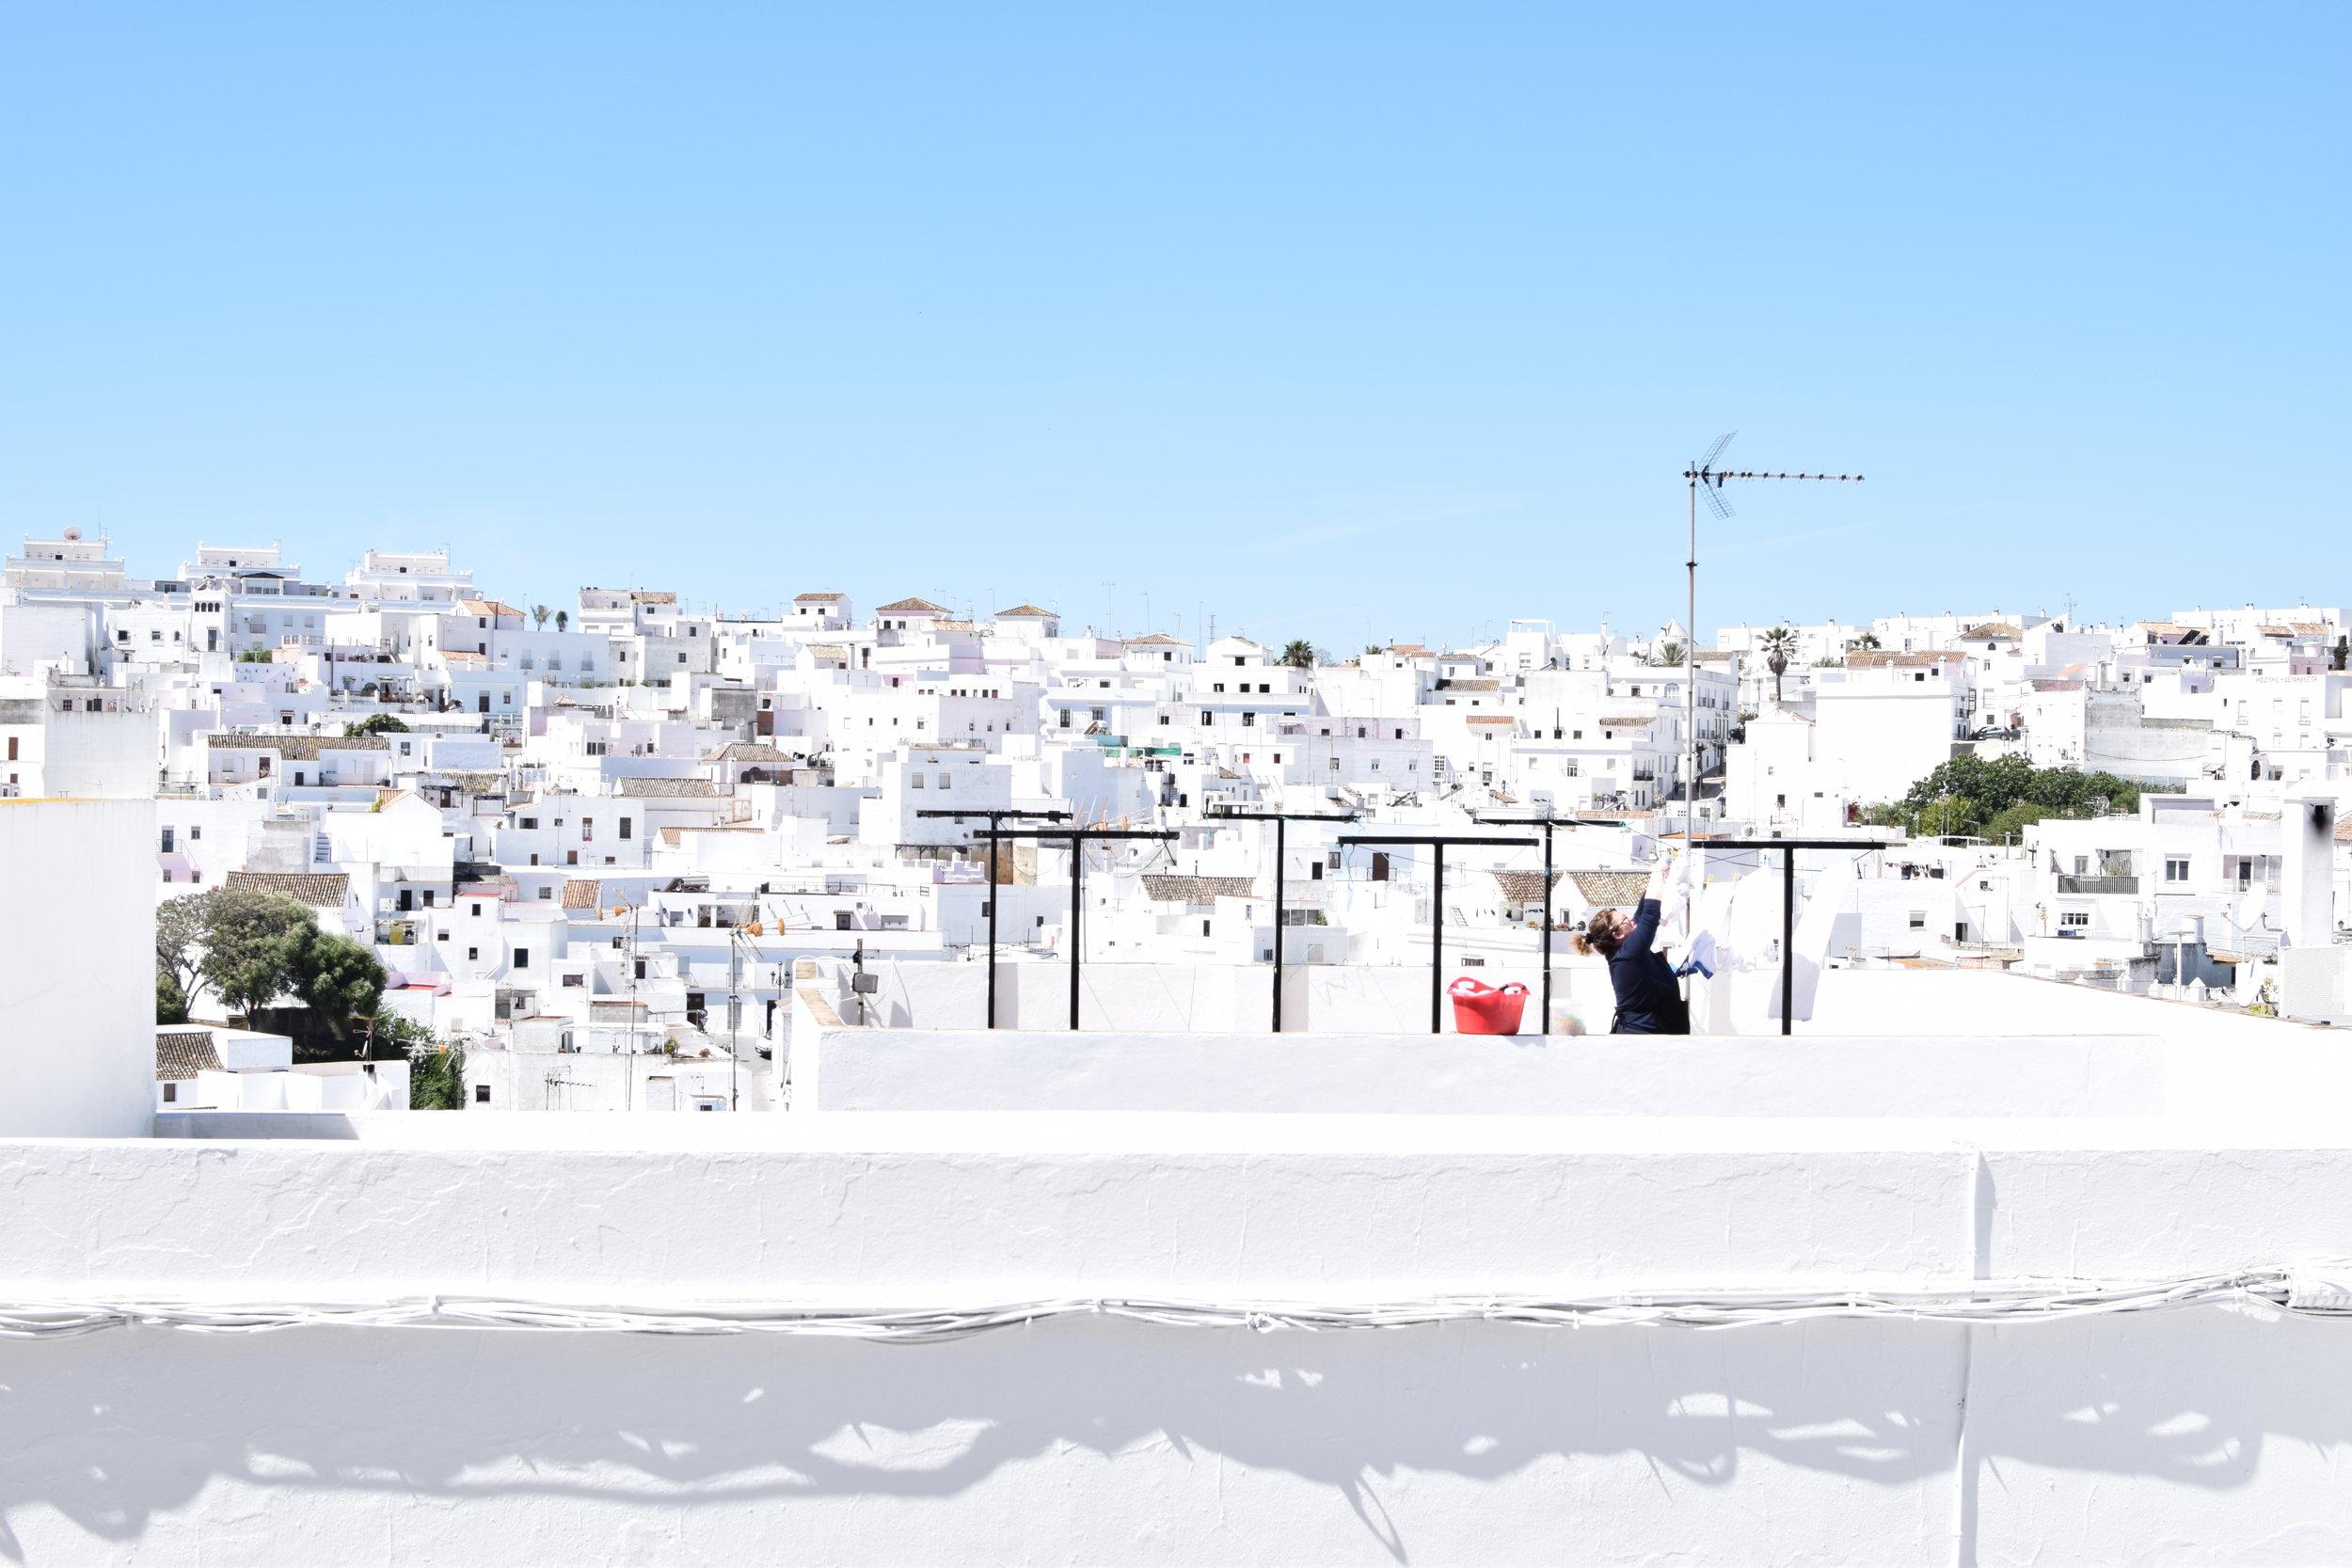 Pueblo-blancos-spain.jpg